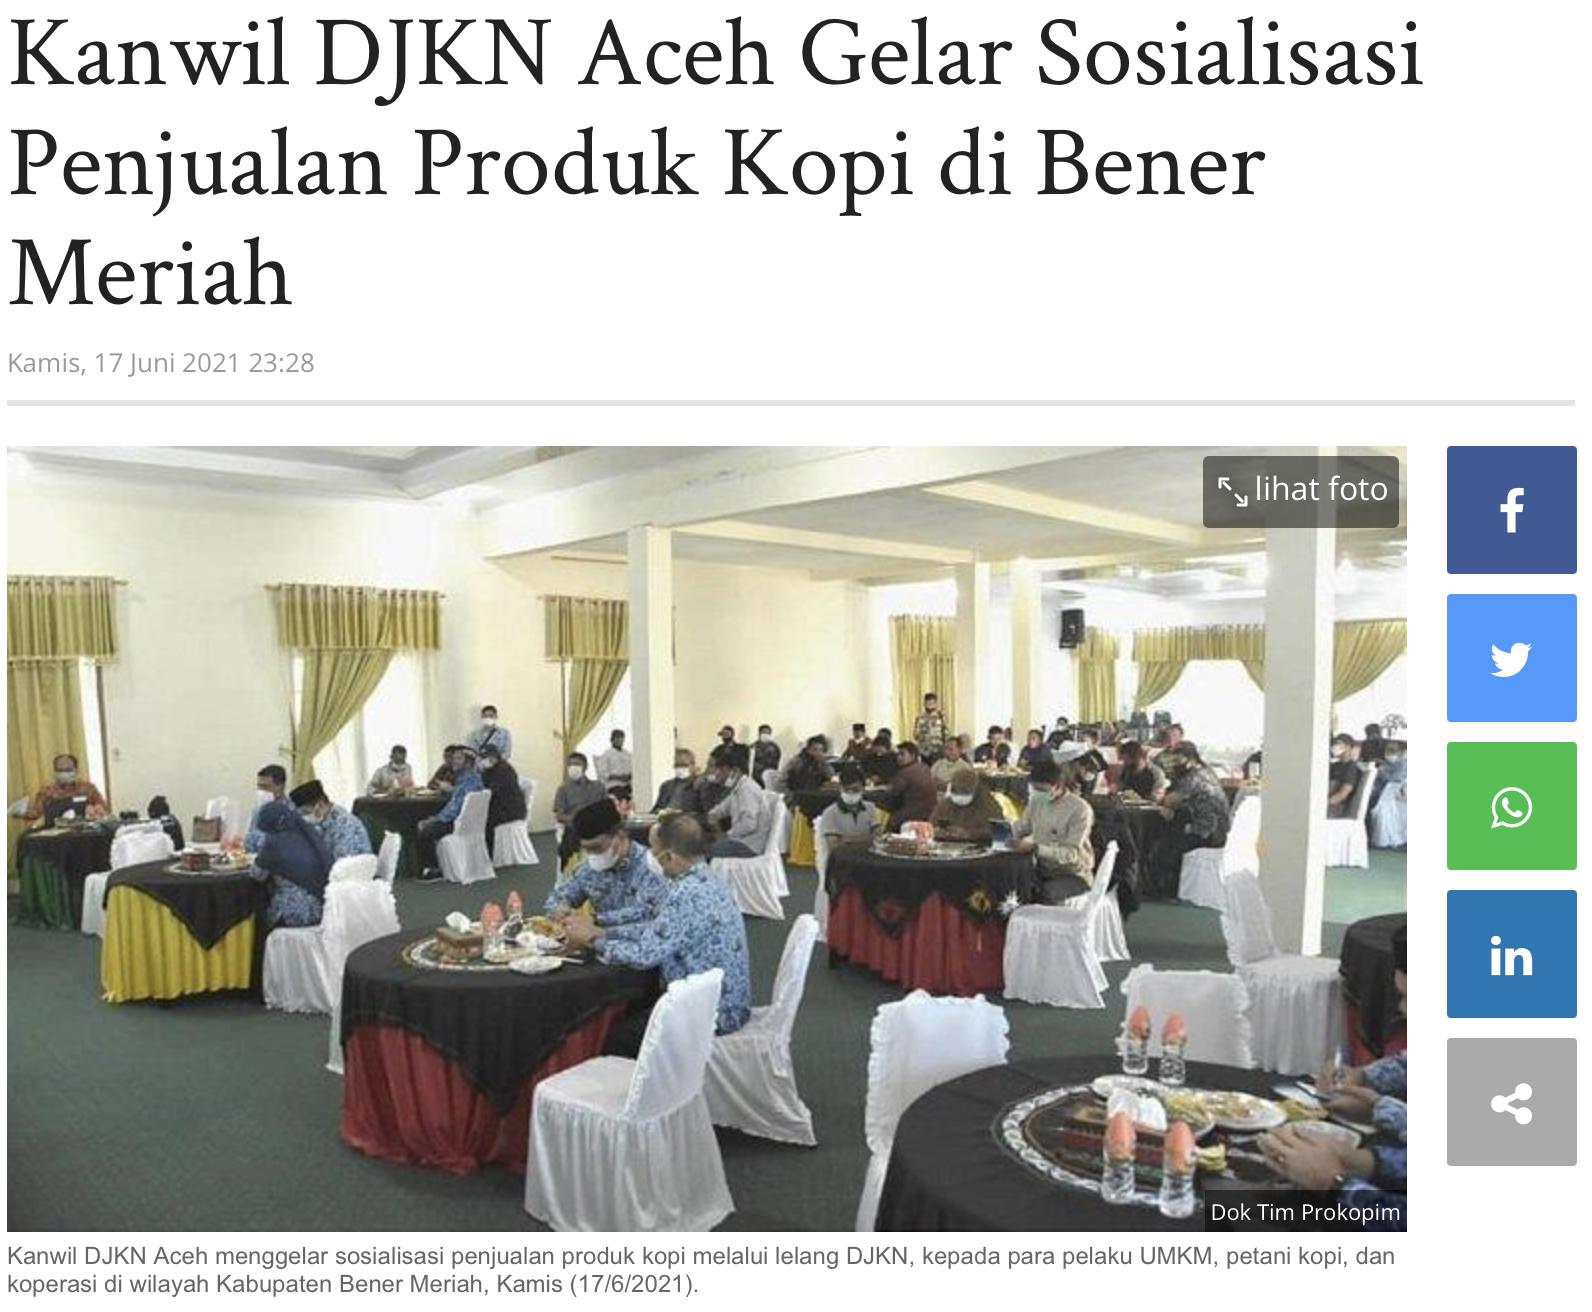 Kanwil DJKN Aceh Gelar Sosialisasi Penjualan Produk Kopi di Bener Meriah